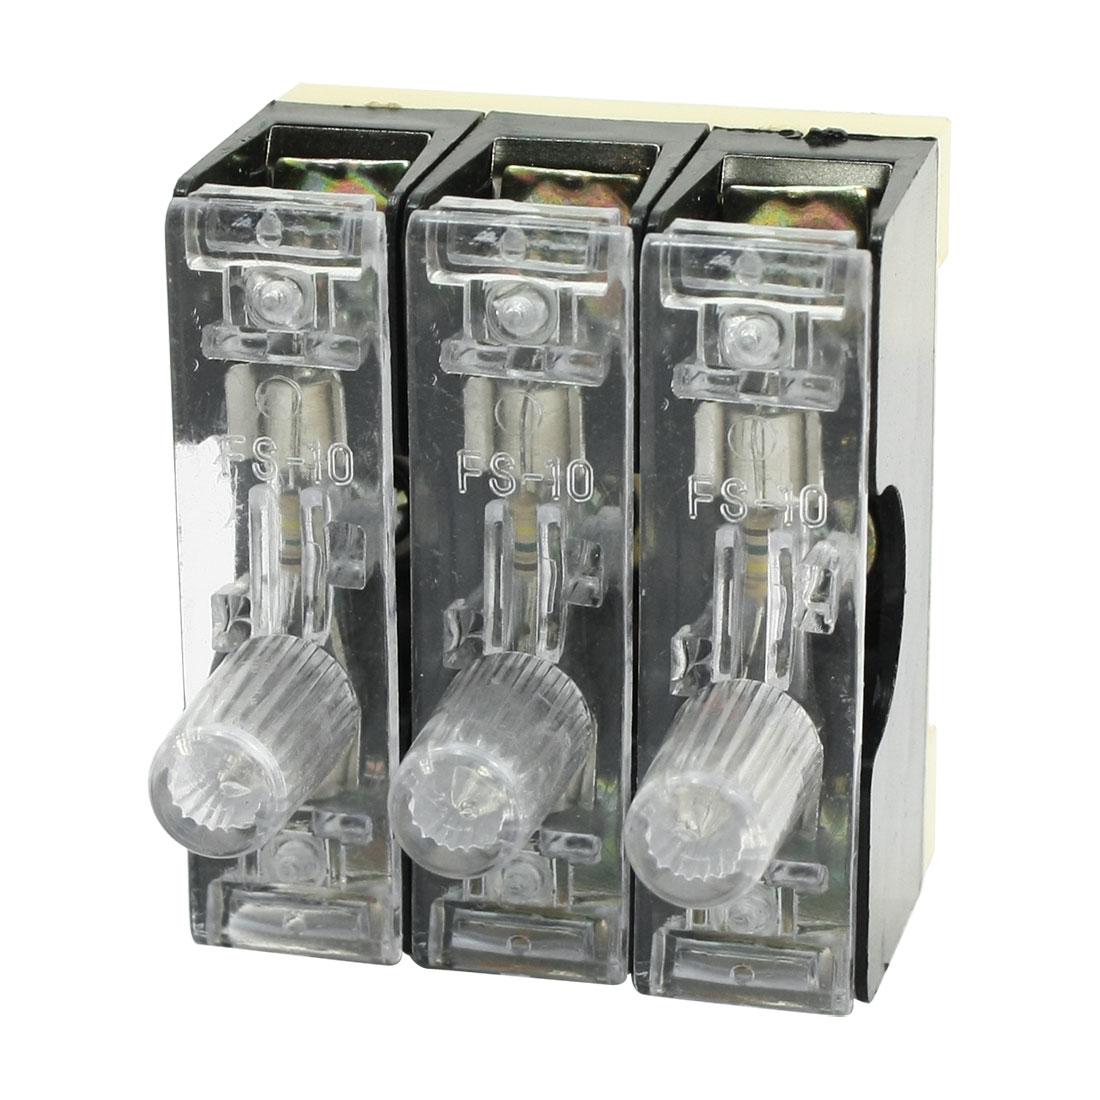 3 in 1 FS-10 250V 10A Single Pole 6 x 30mm Fuse Holder Base